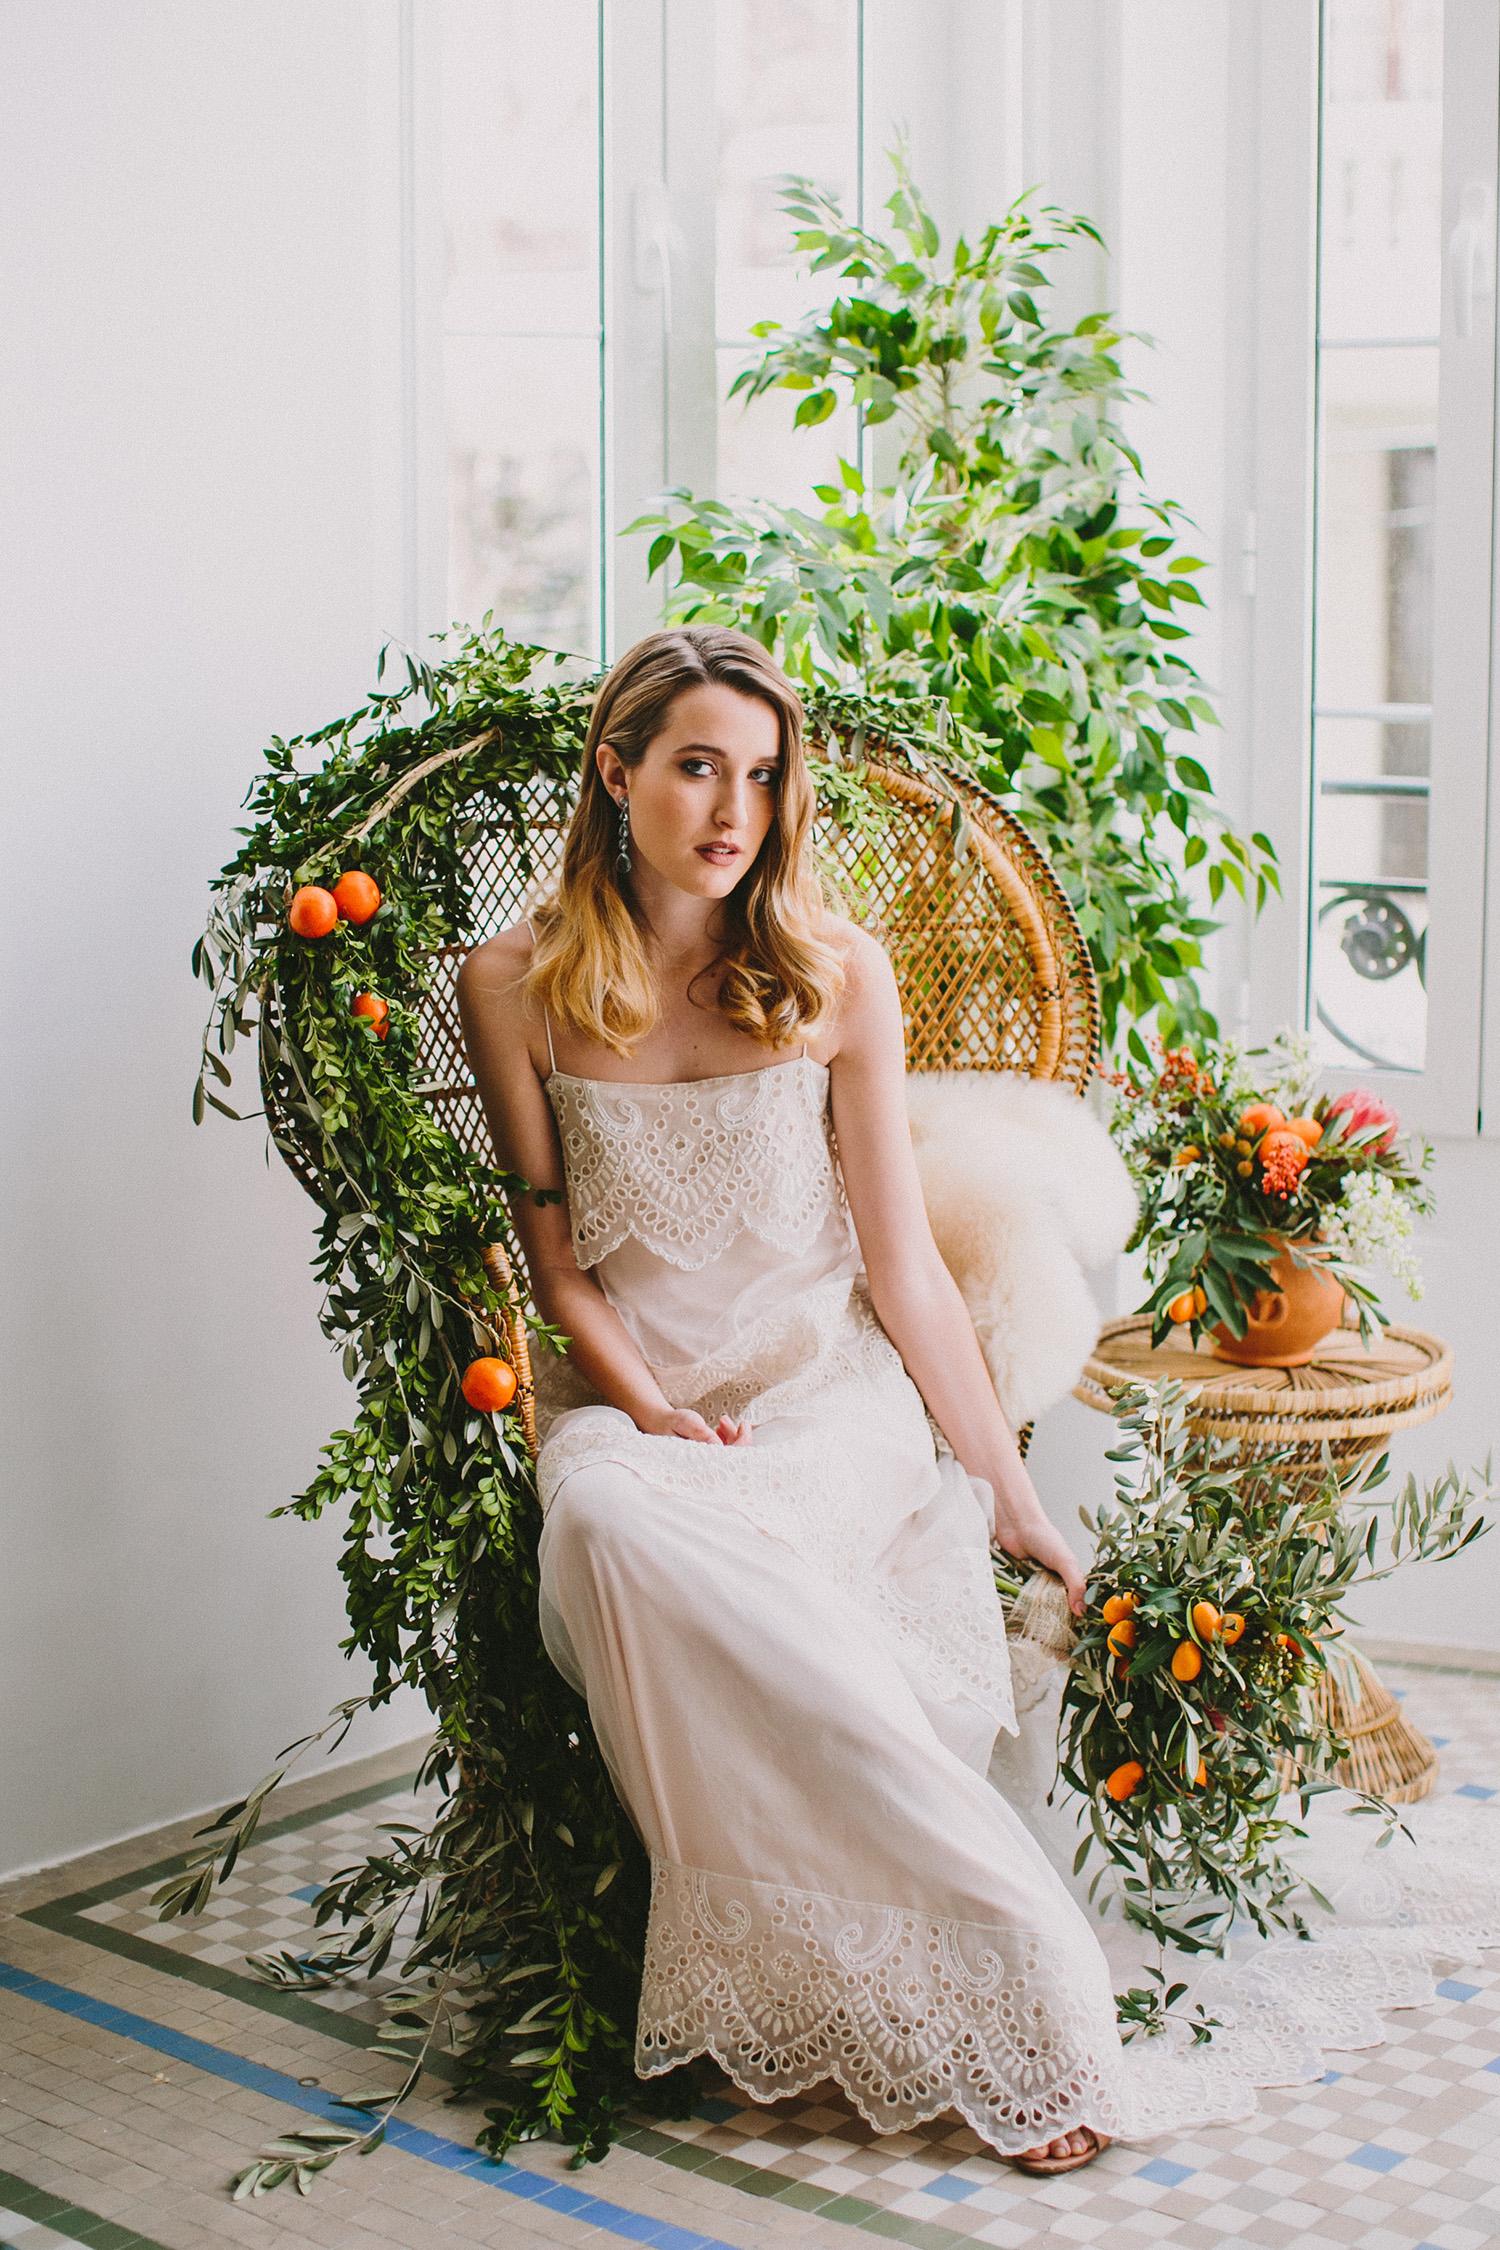 bridal wedding inspiration - photo by Paula G Furio http://ruffledblog.com/1920s-mediterranean-wedding-inspiration-in-valencia-spain